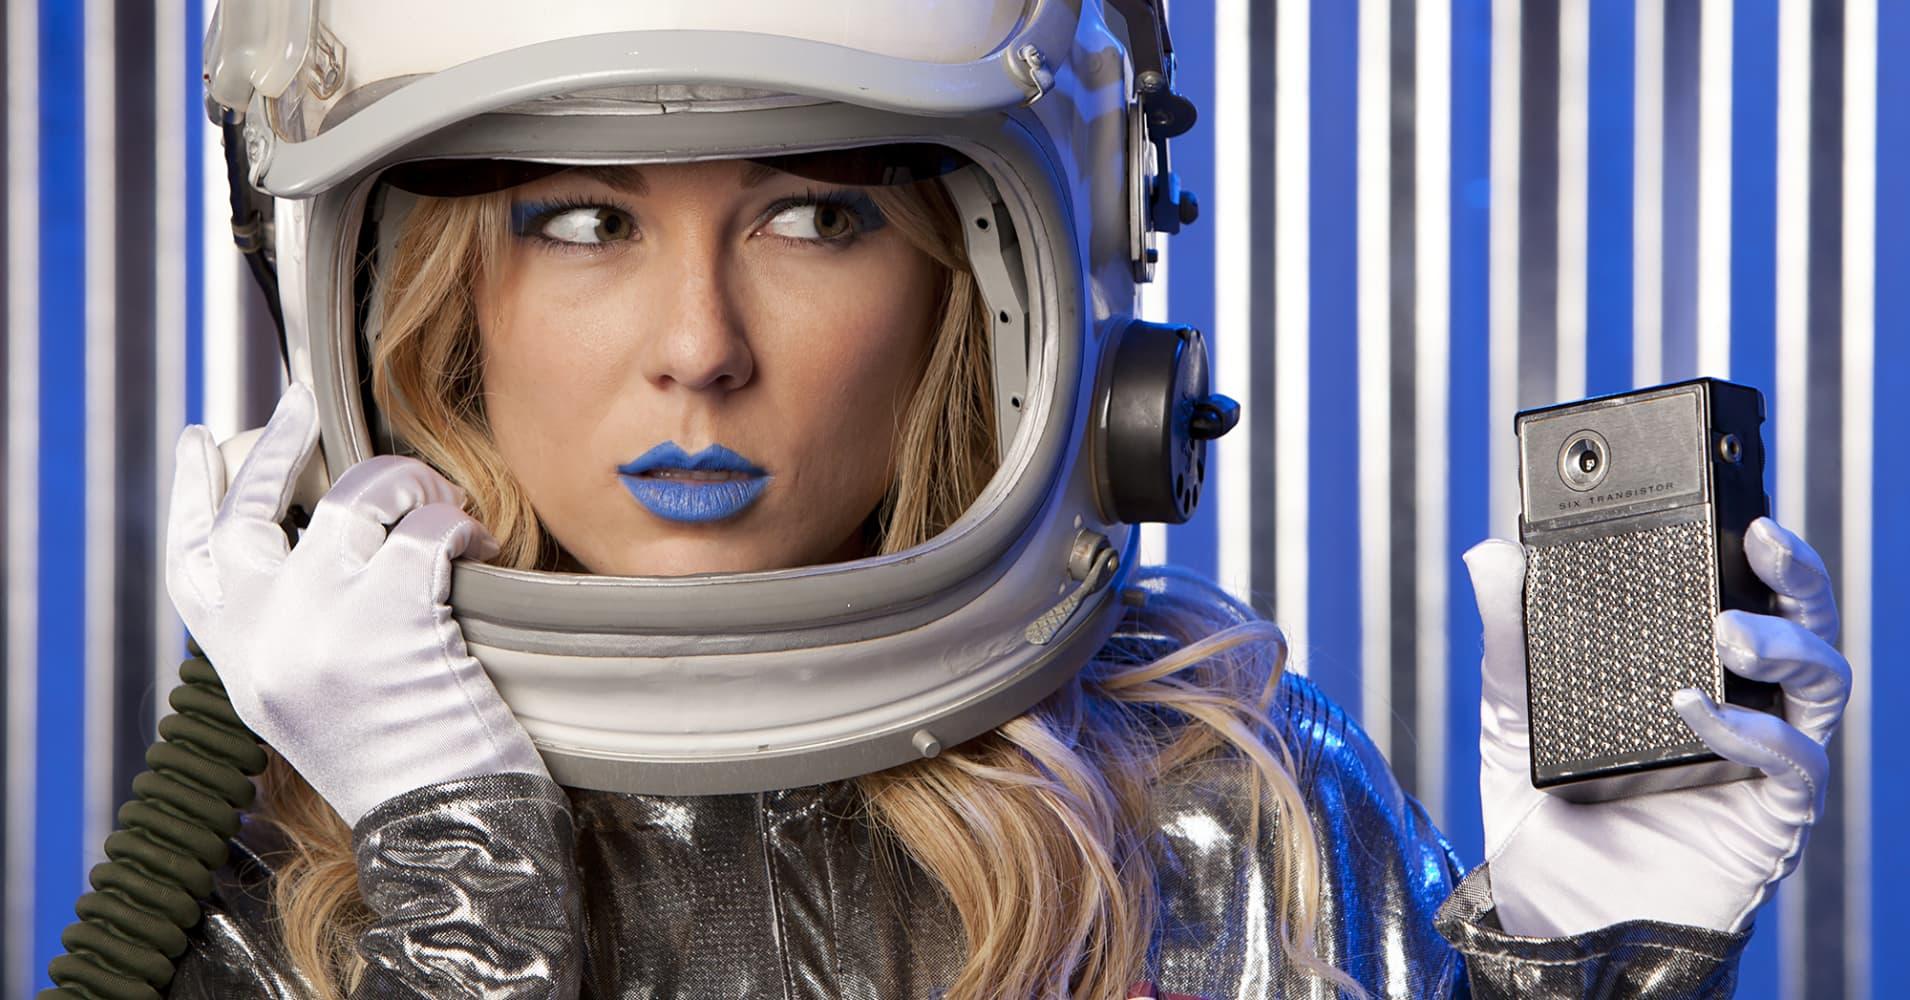 Pornhub Launches Crowdfund To Film Movie In Space-7074